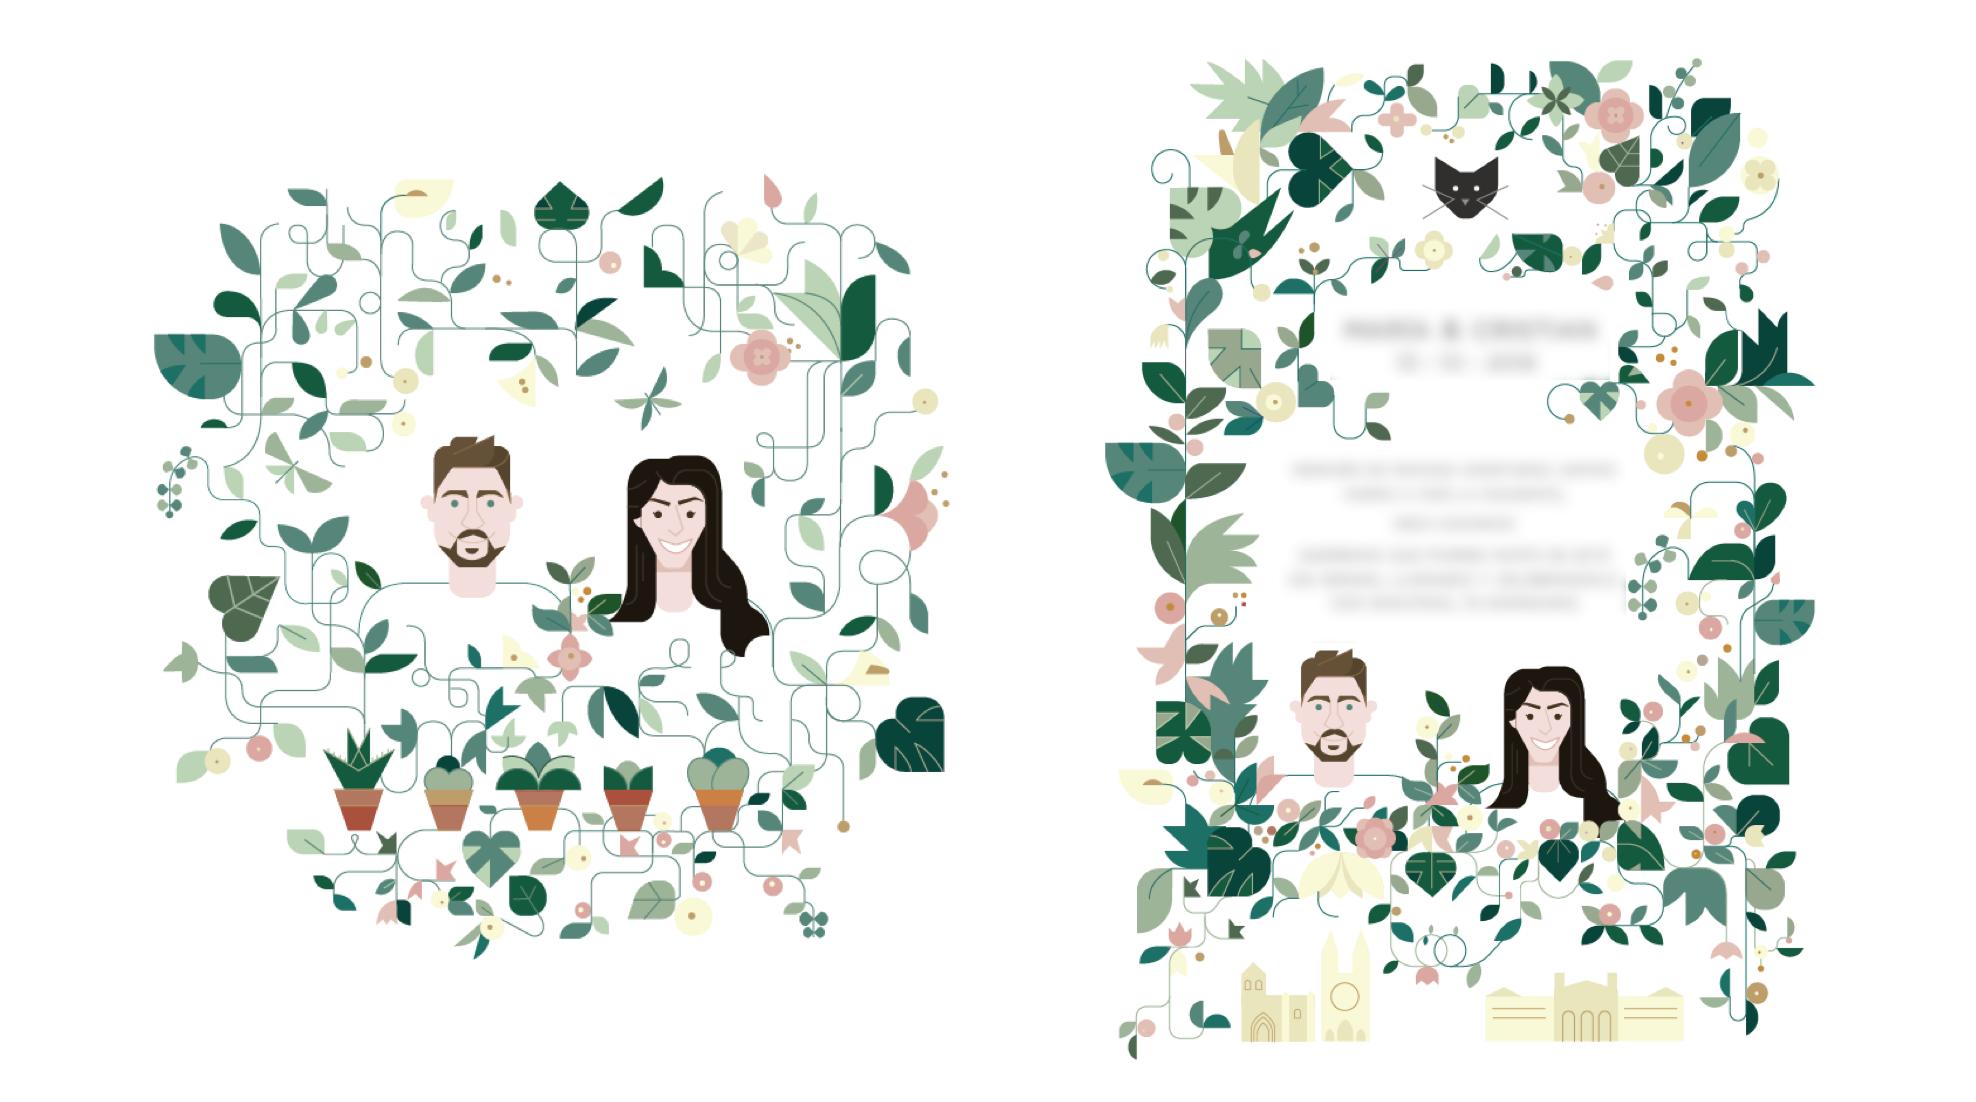 invitacion, boda, pareja, plantas, flores, flowers.png